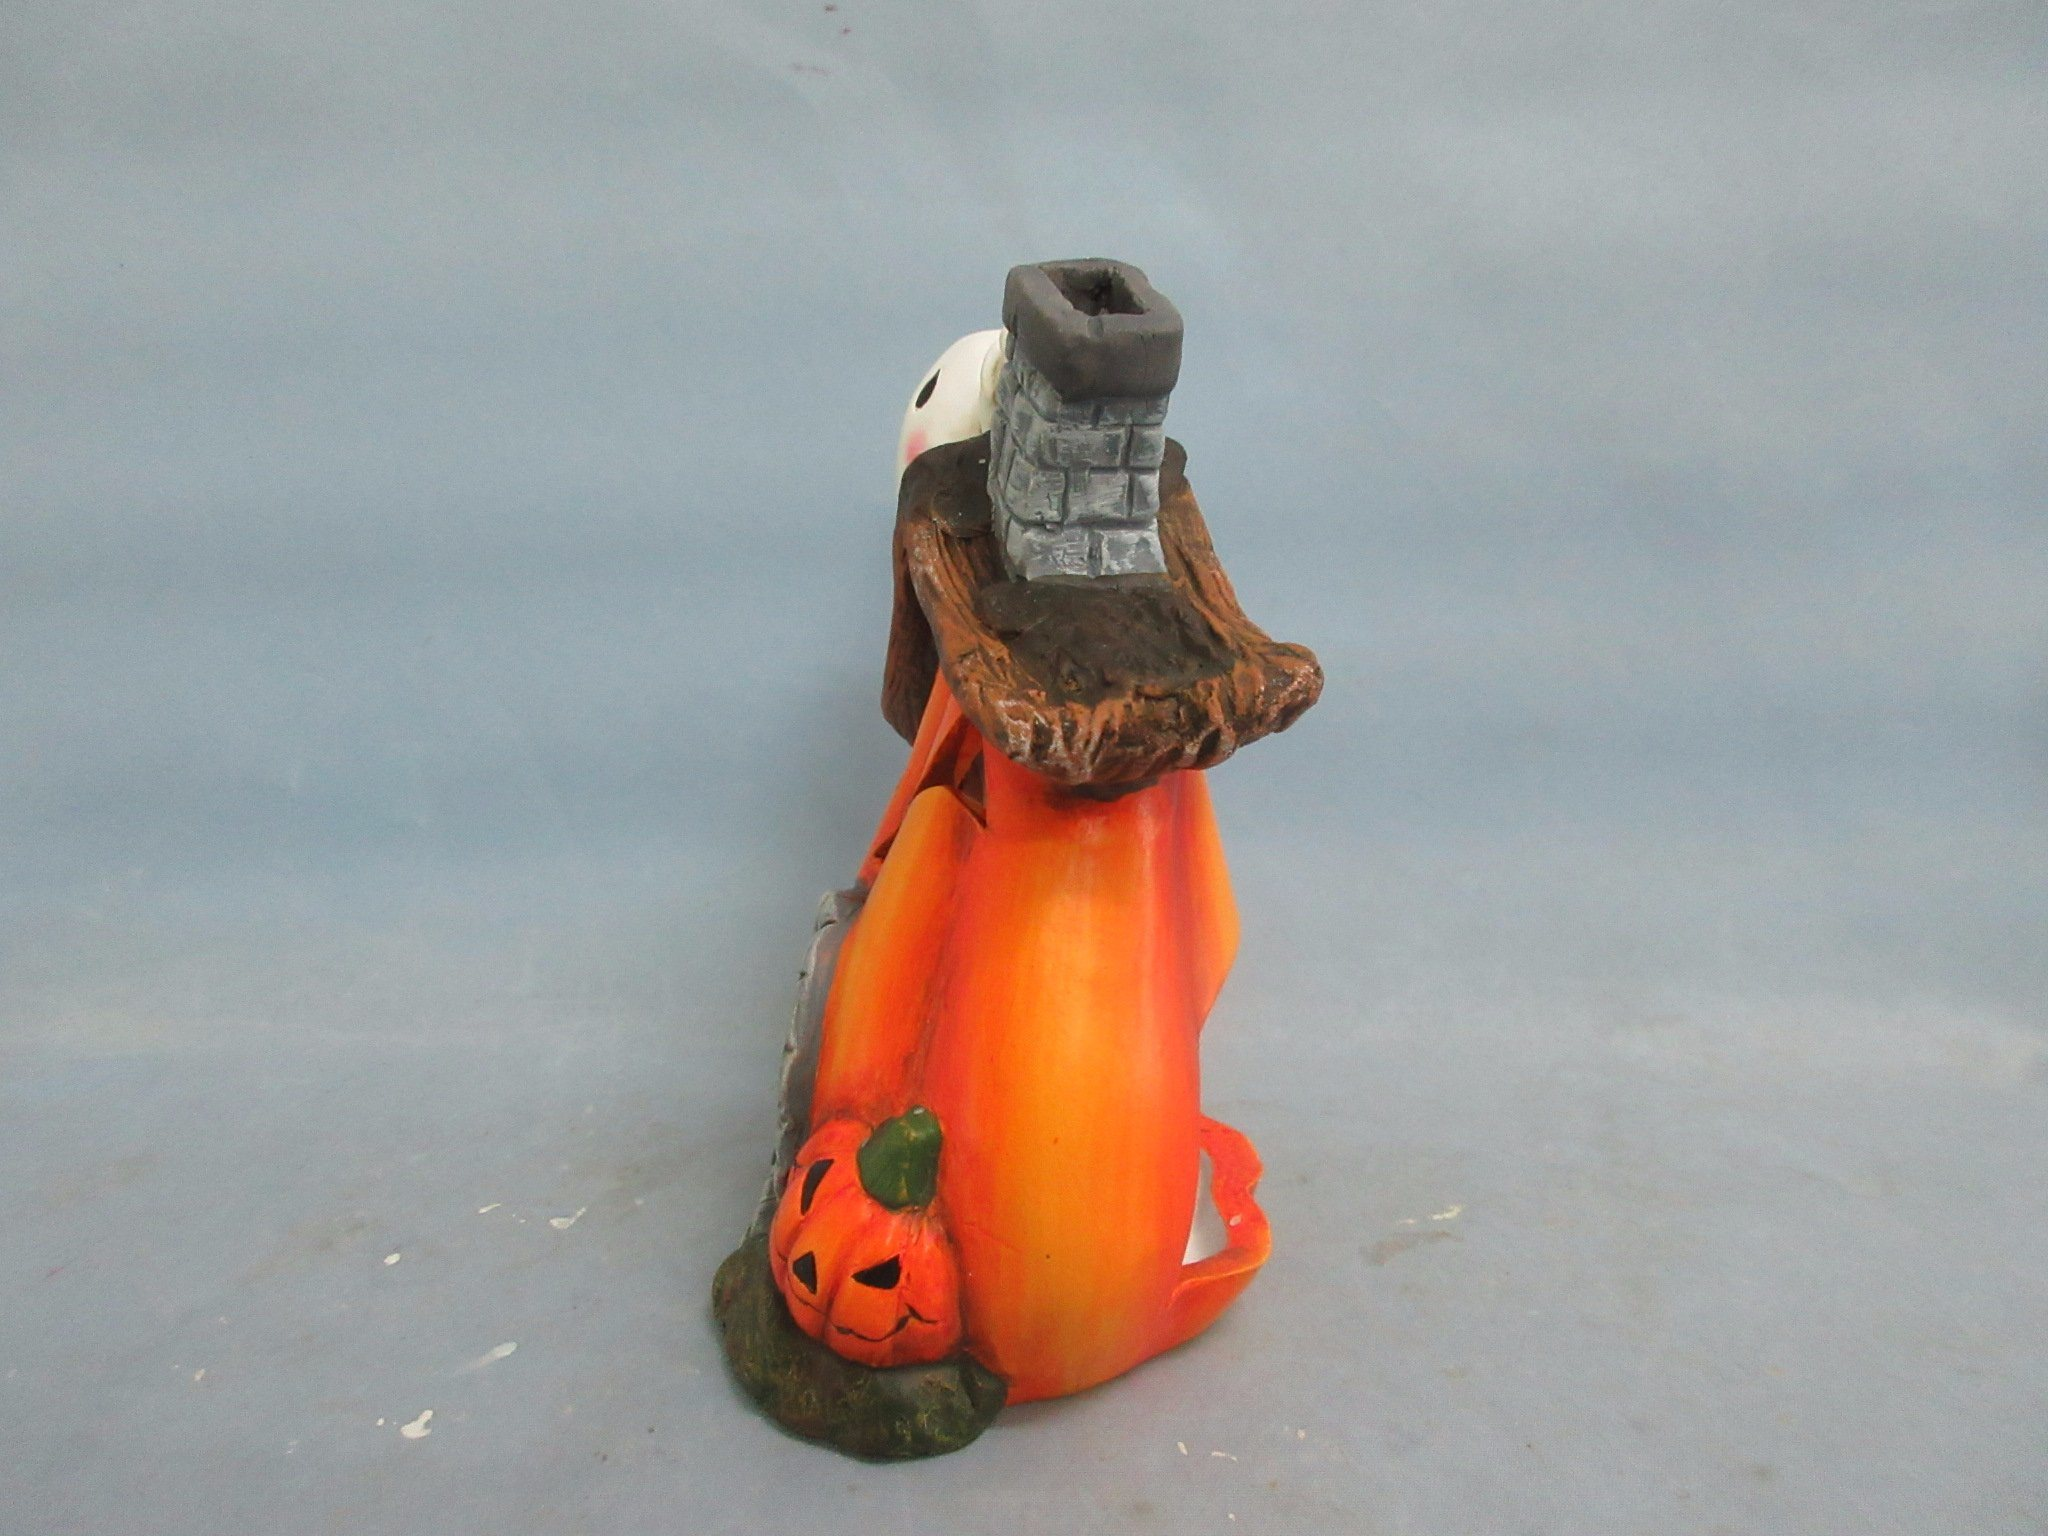 Halloween Pumpkin Ceramic Arts and Crafts (LOE2681-17z)